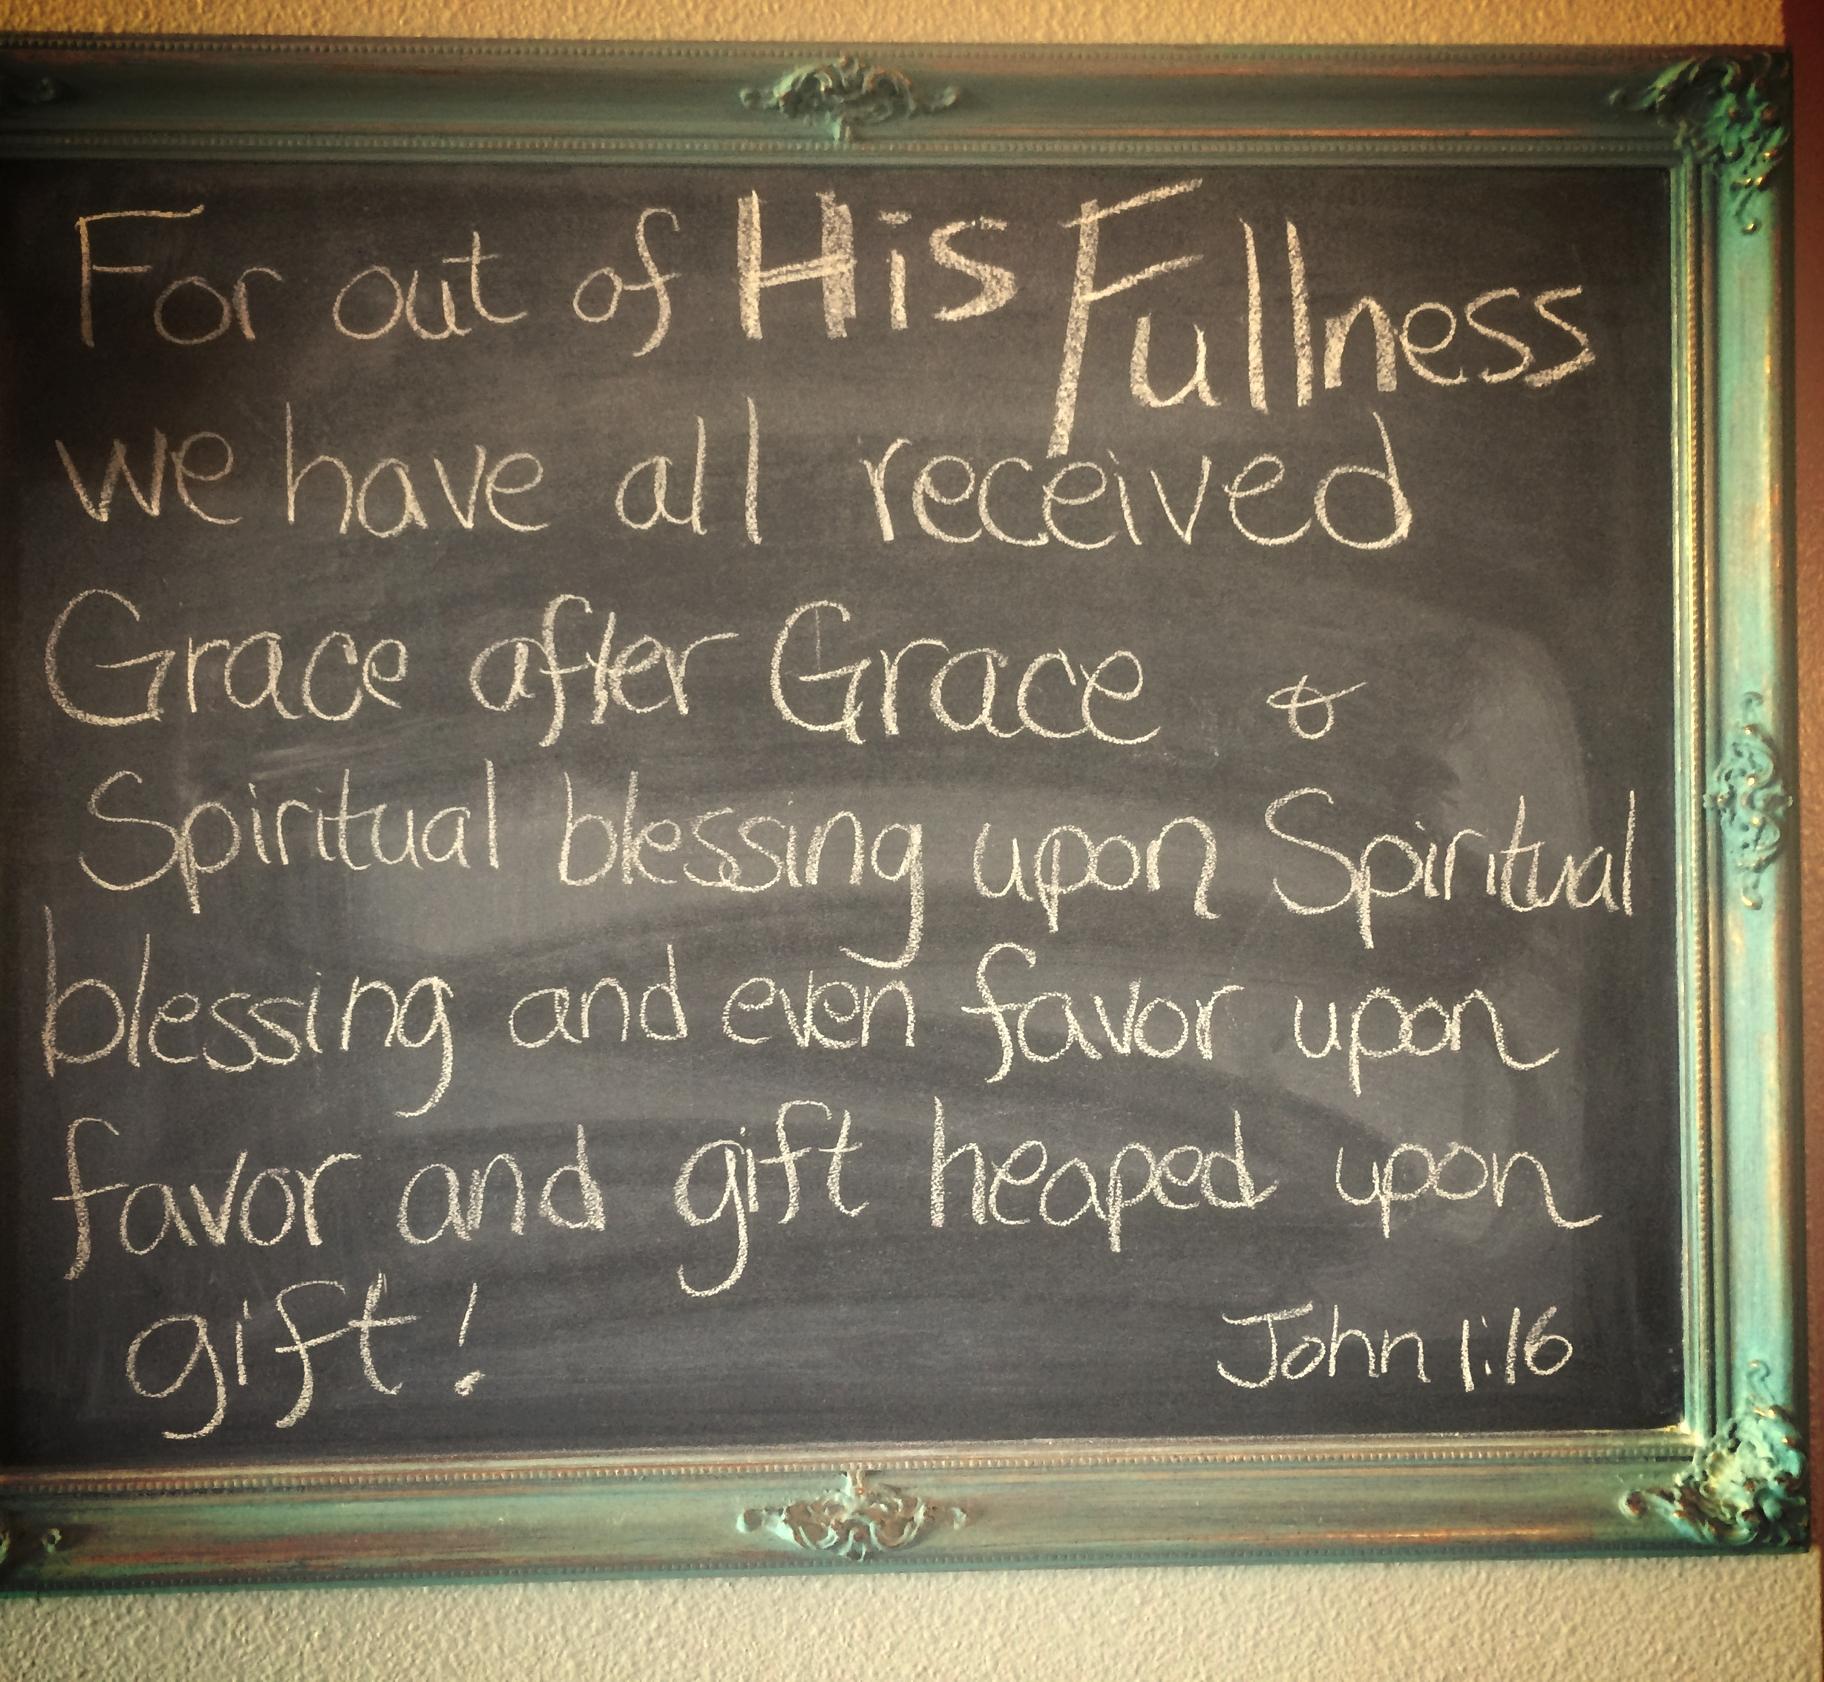 John 1:16 chalkbord